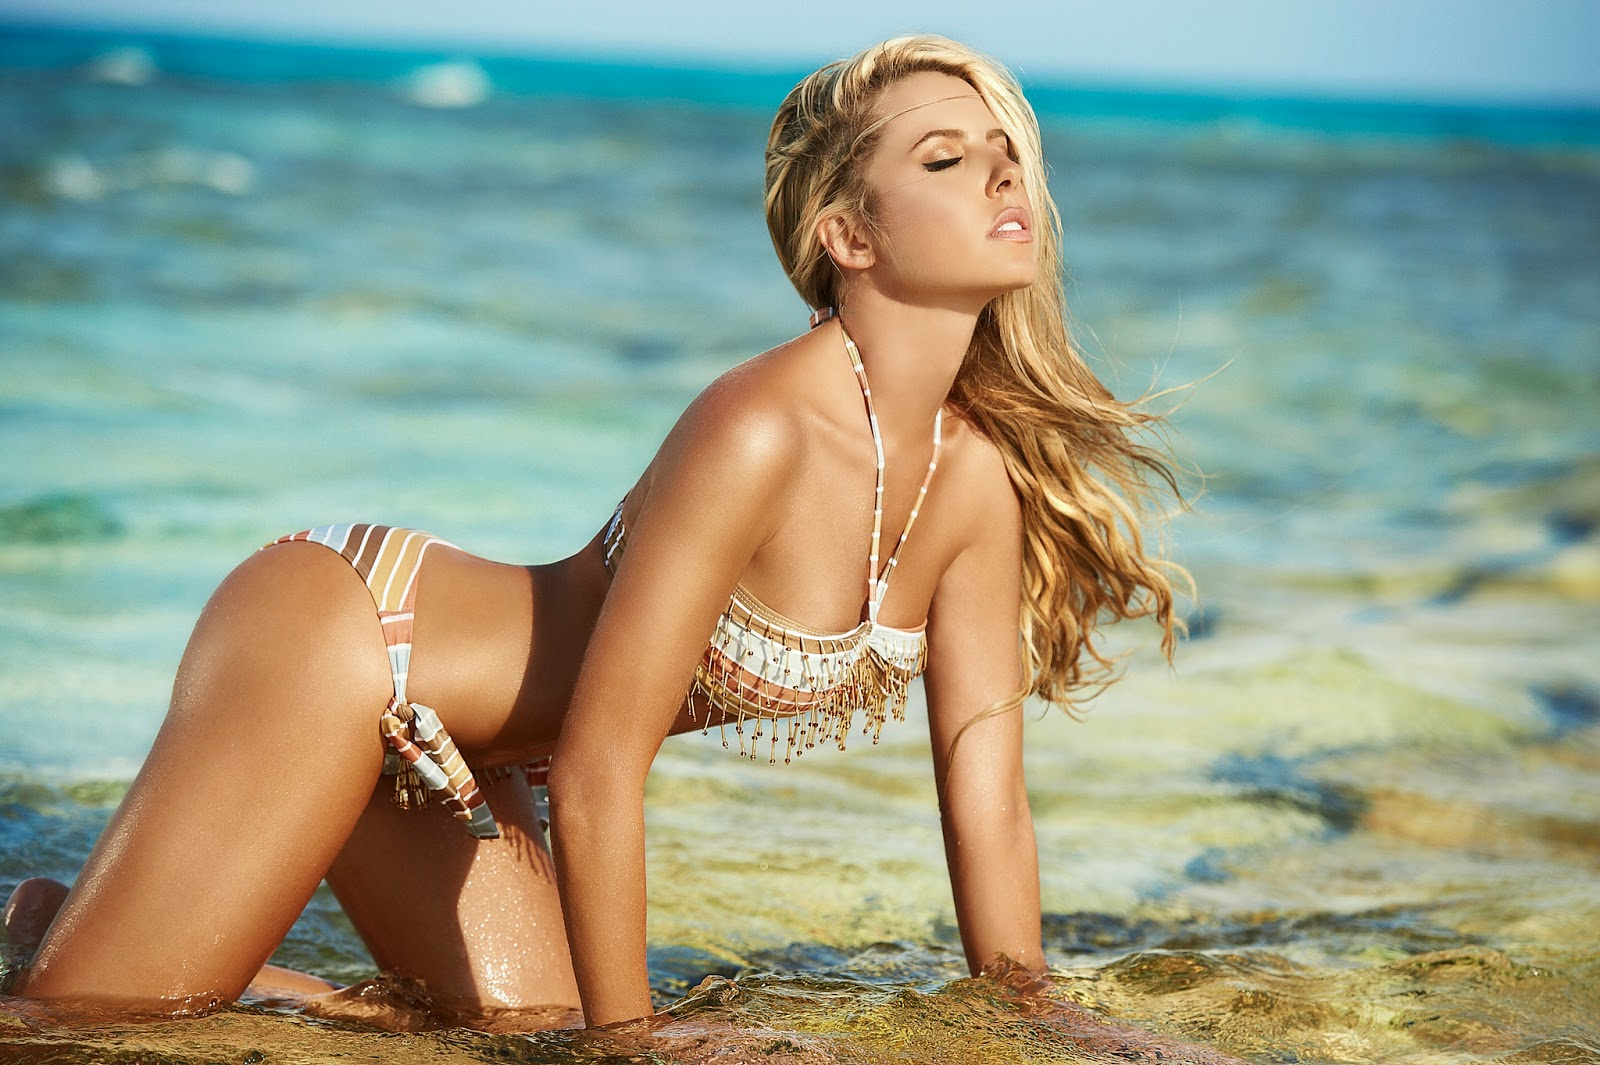 lina posada bikini photoshoot gotceleb